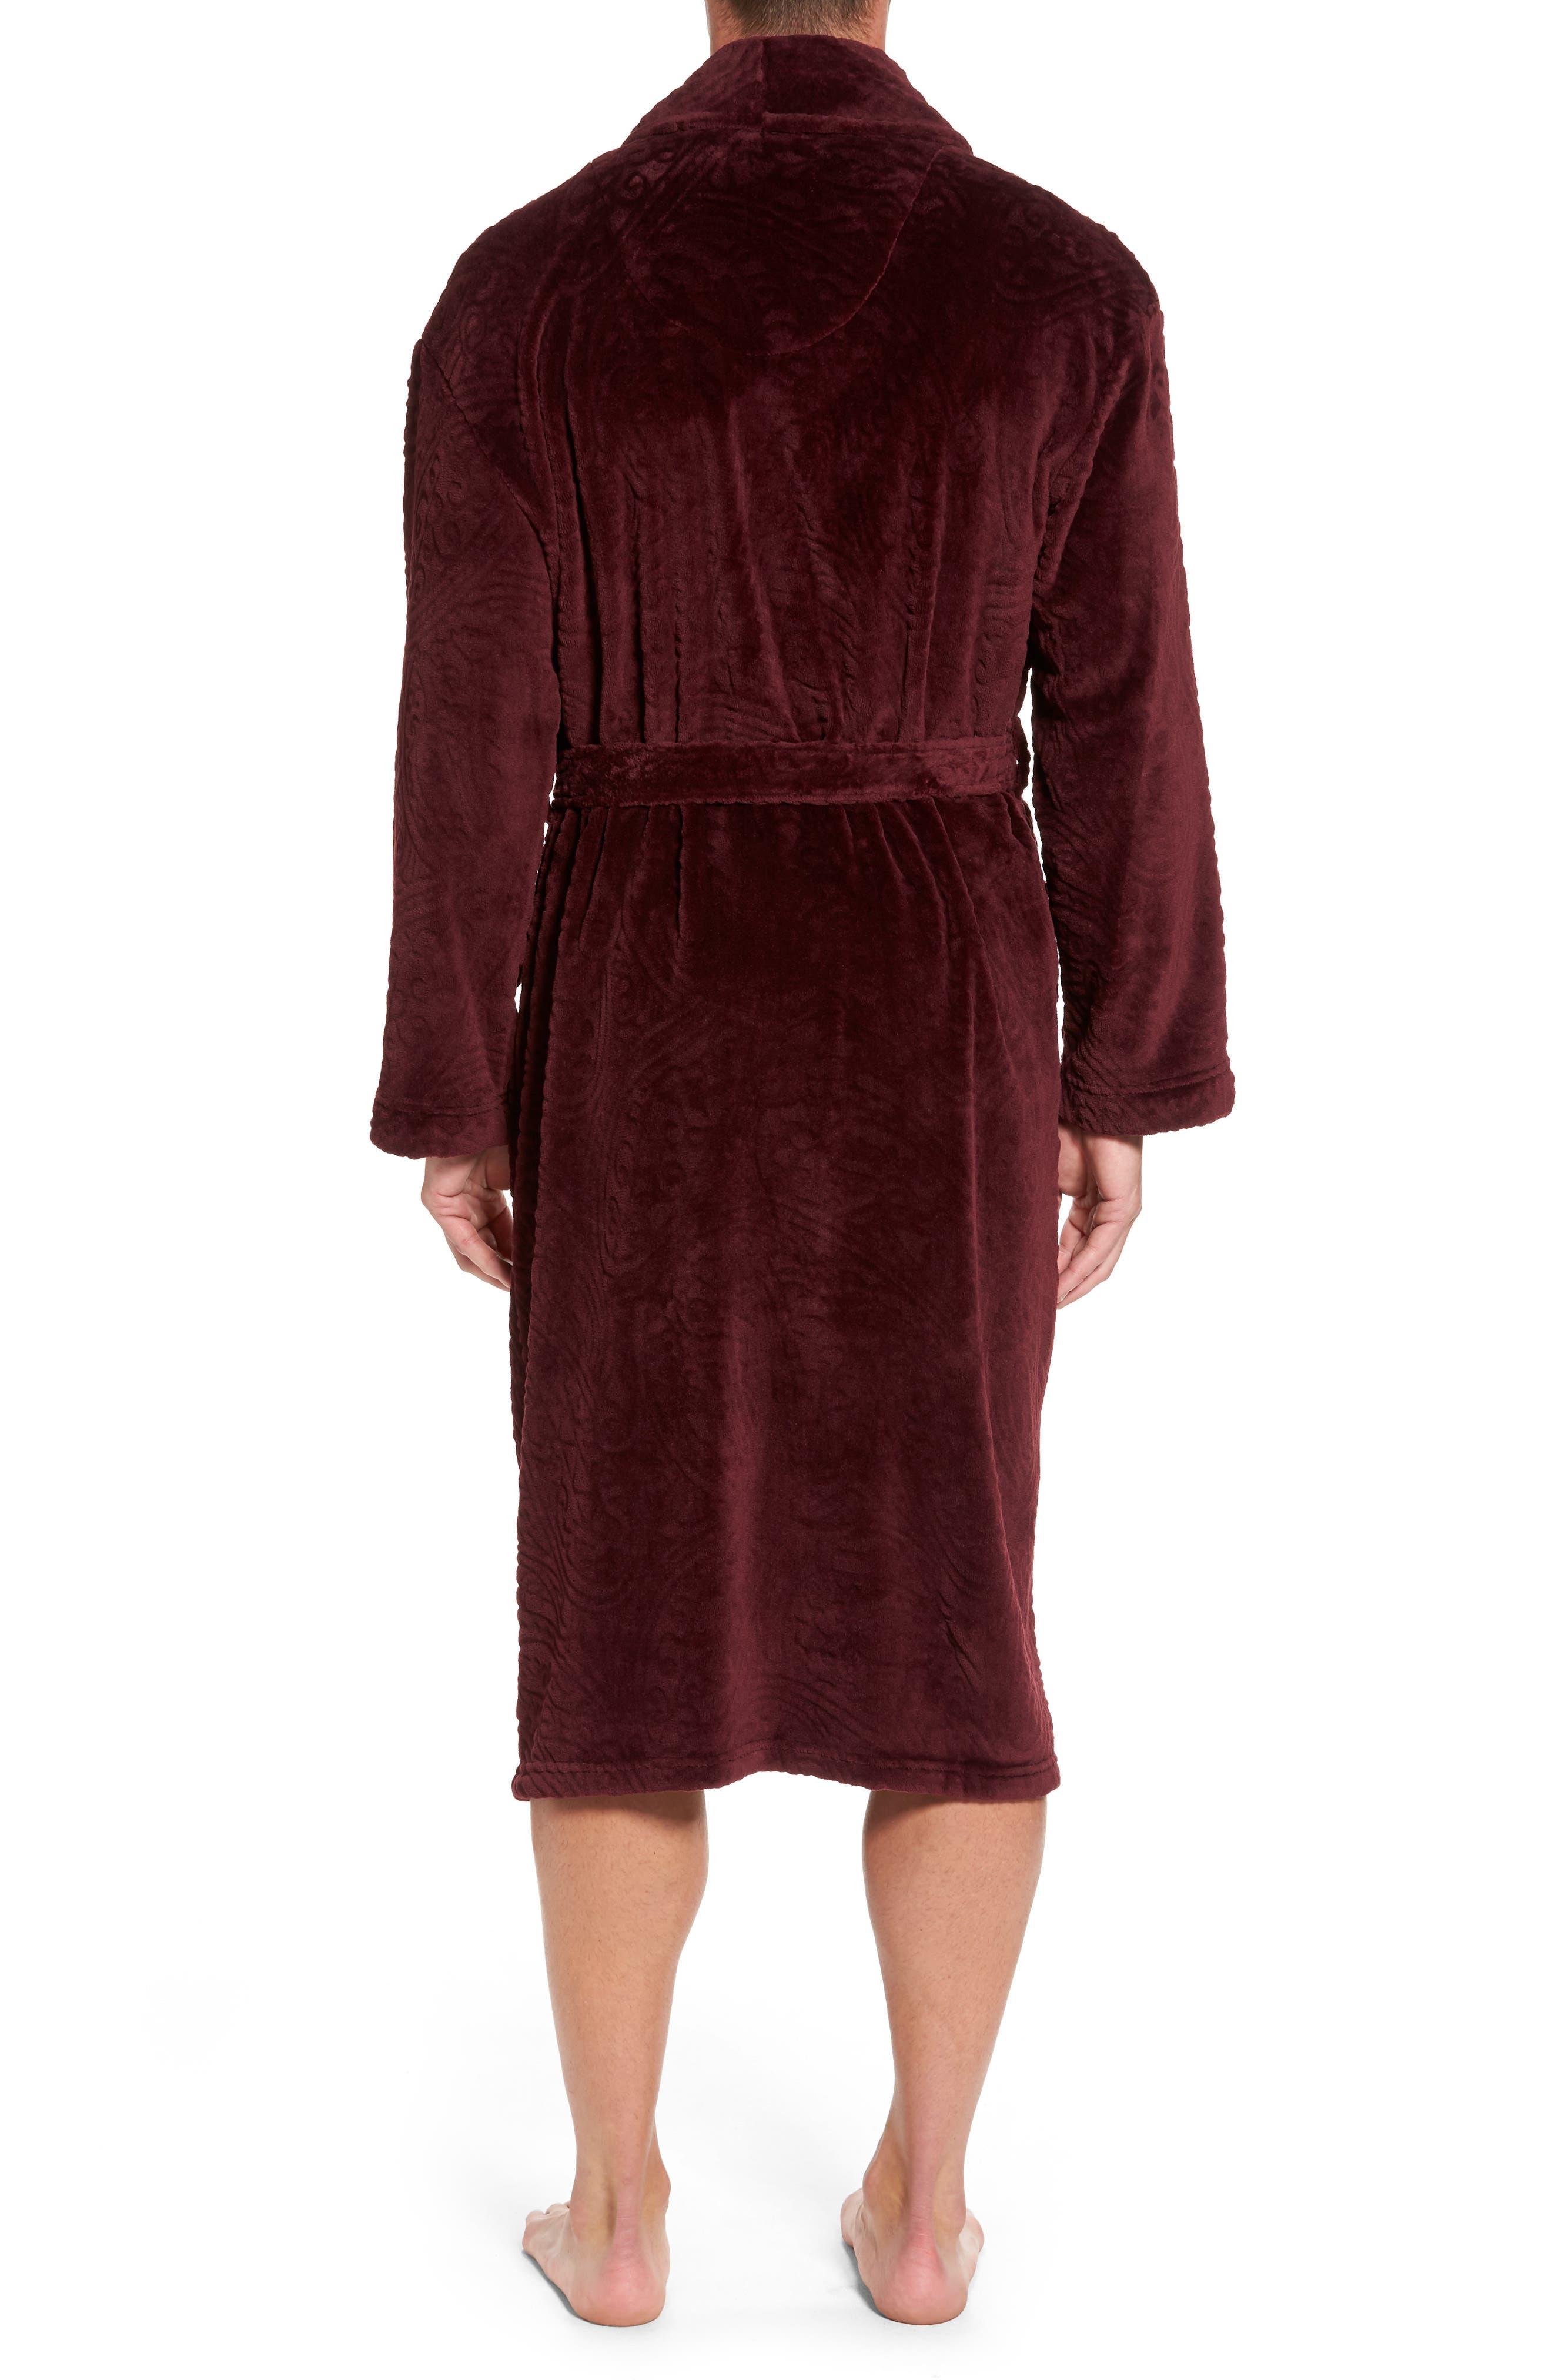 Midtown Robe,                             Alternate thumbnail 2, color,                             Burgundy Paisley